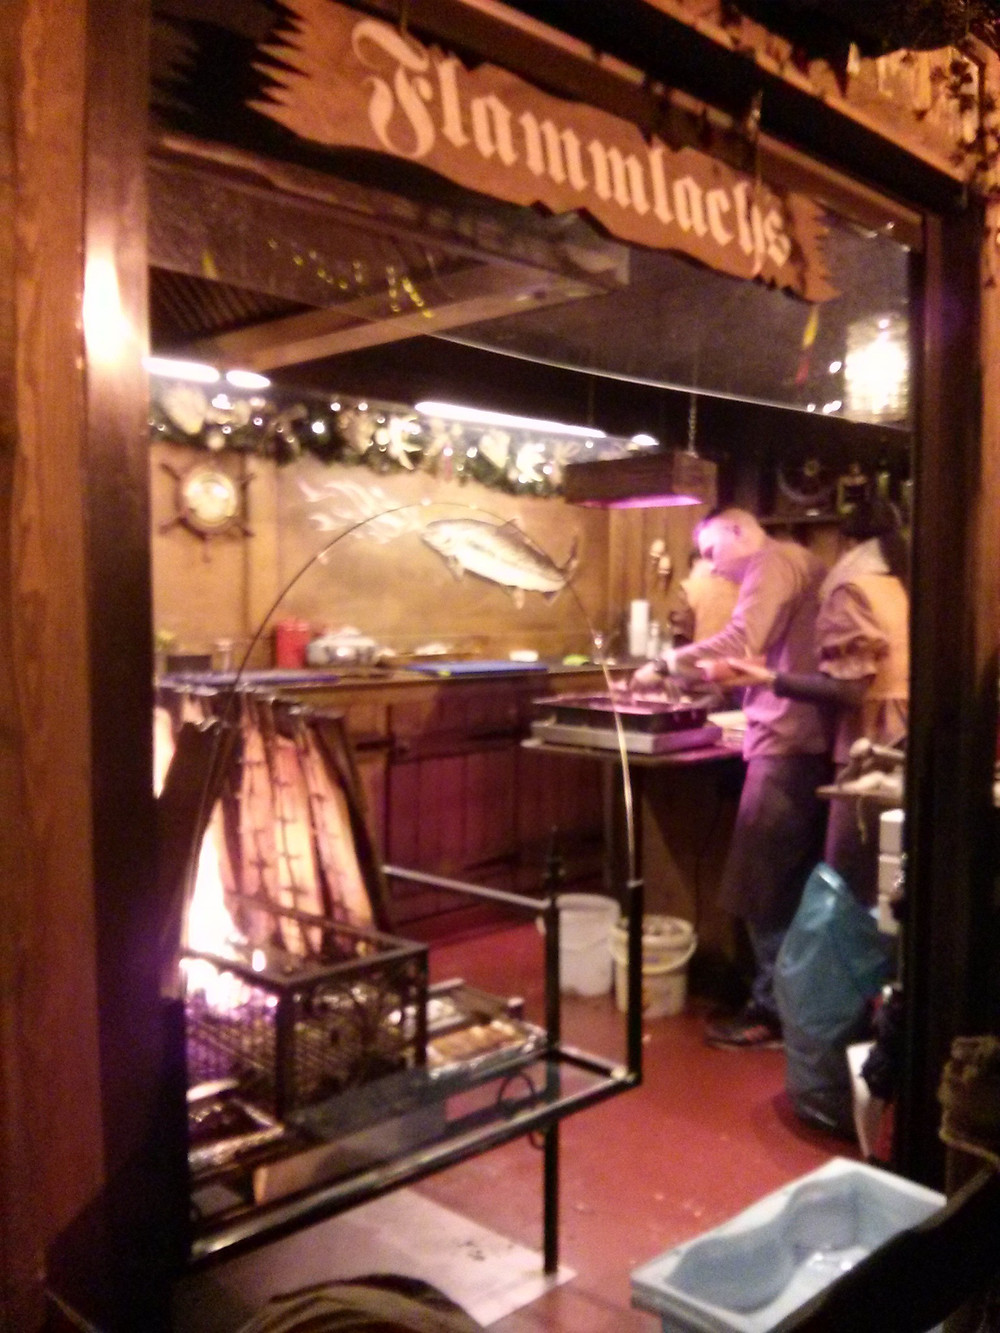 mercats de nadal alemanya mercadillos de navidad alemania 11